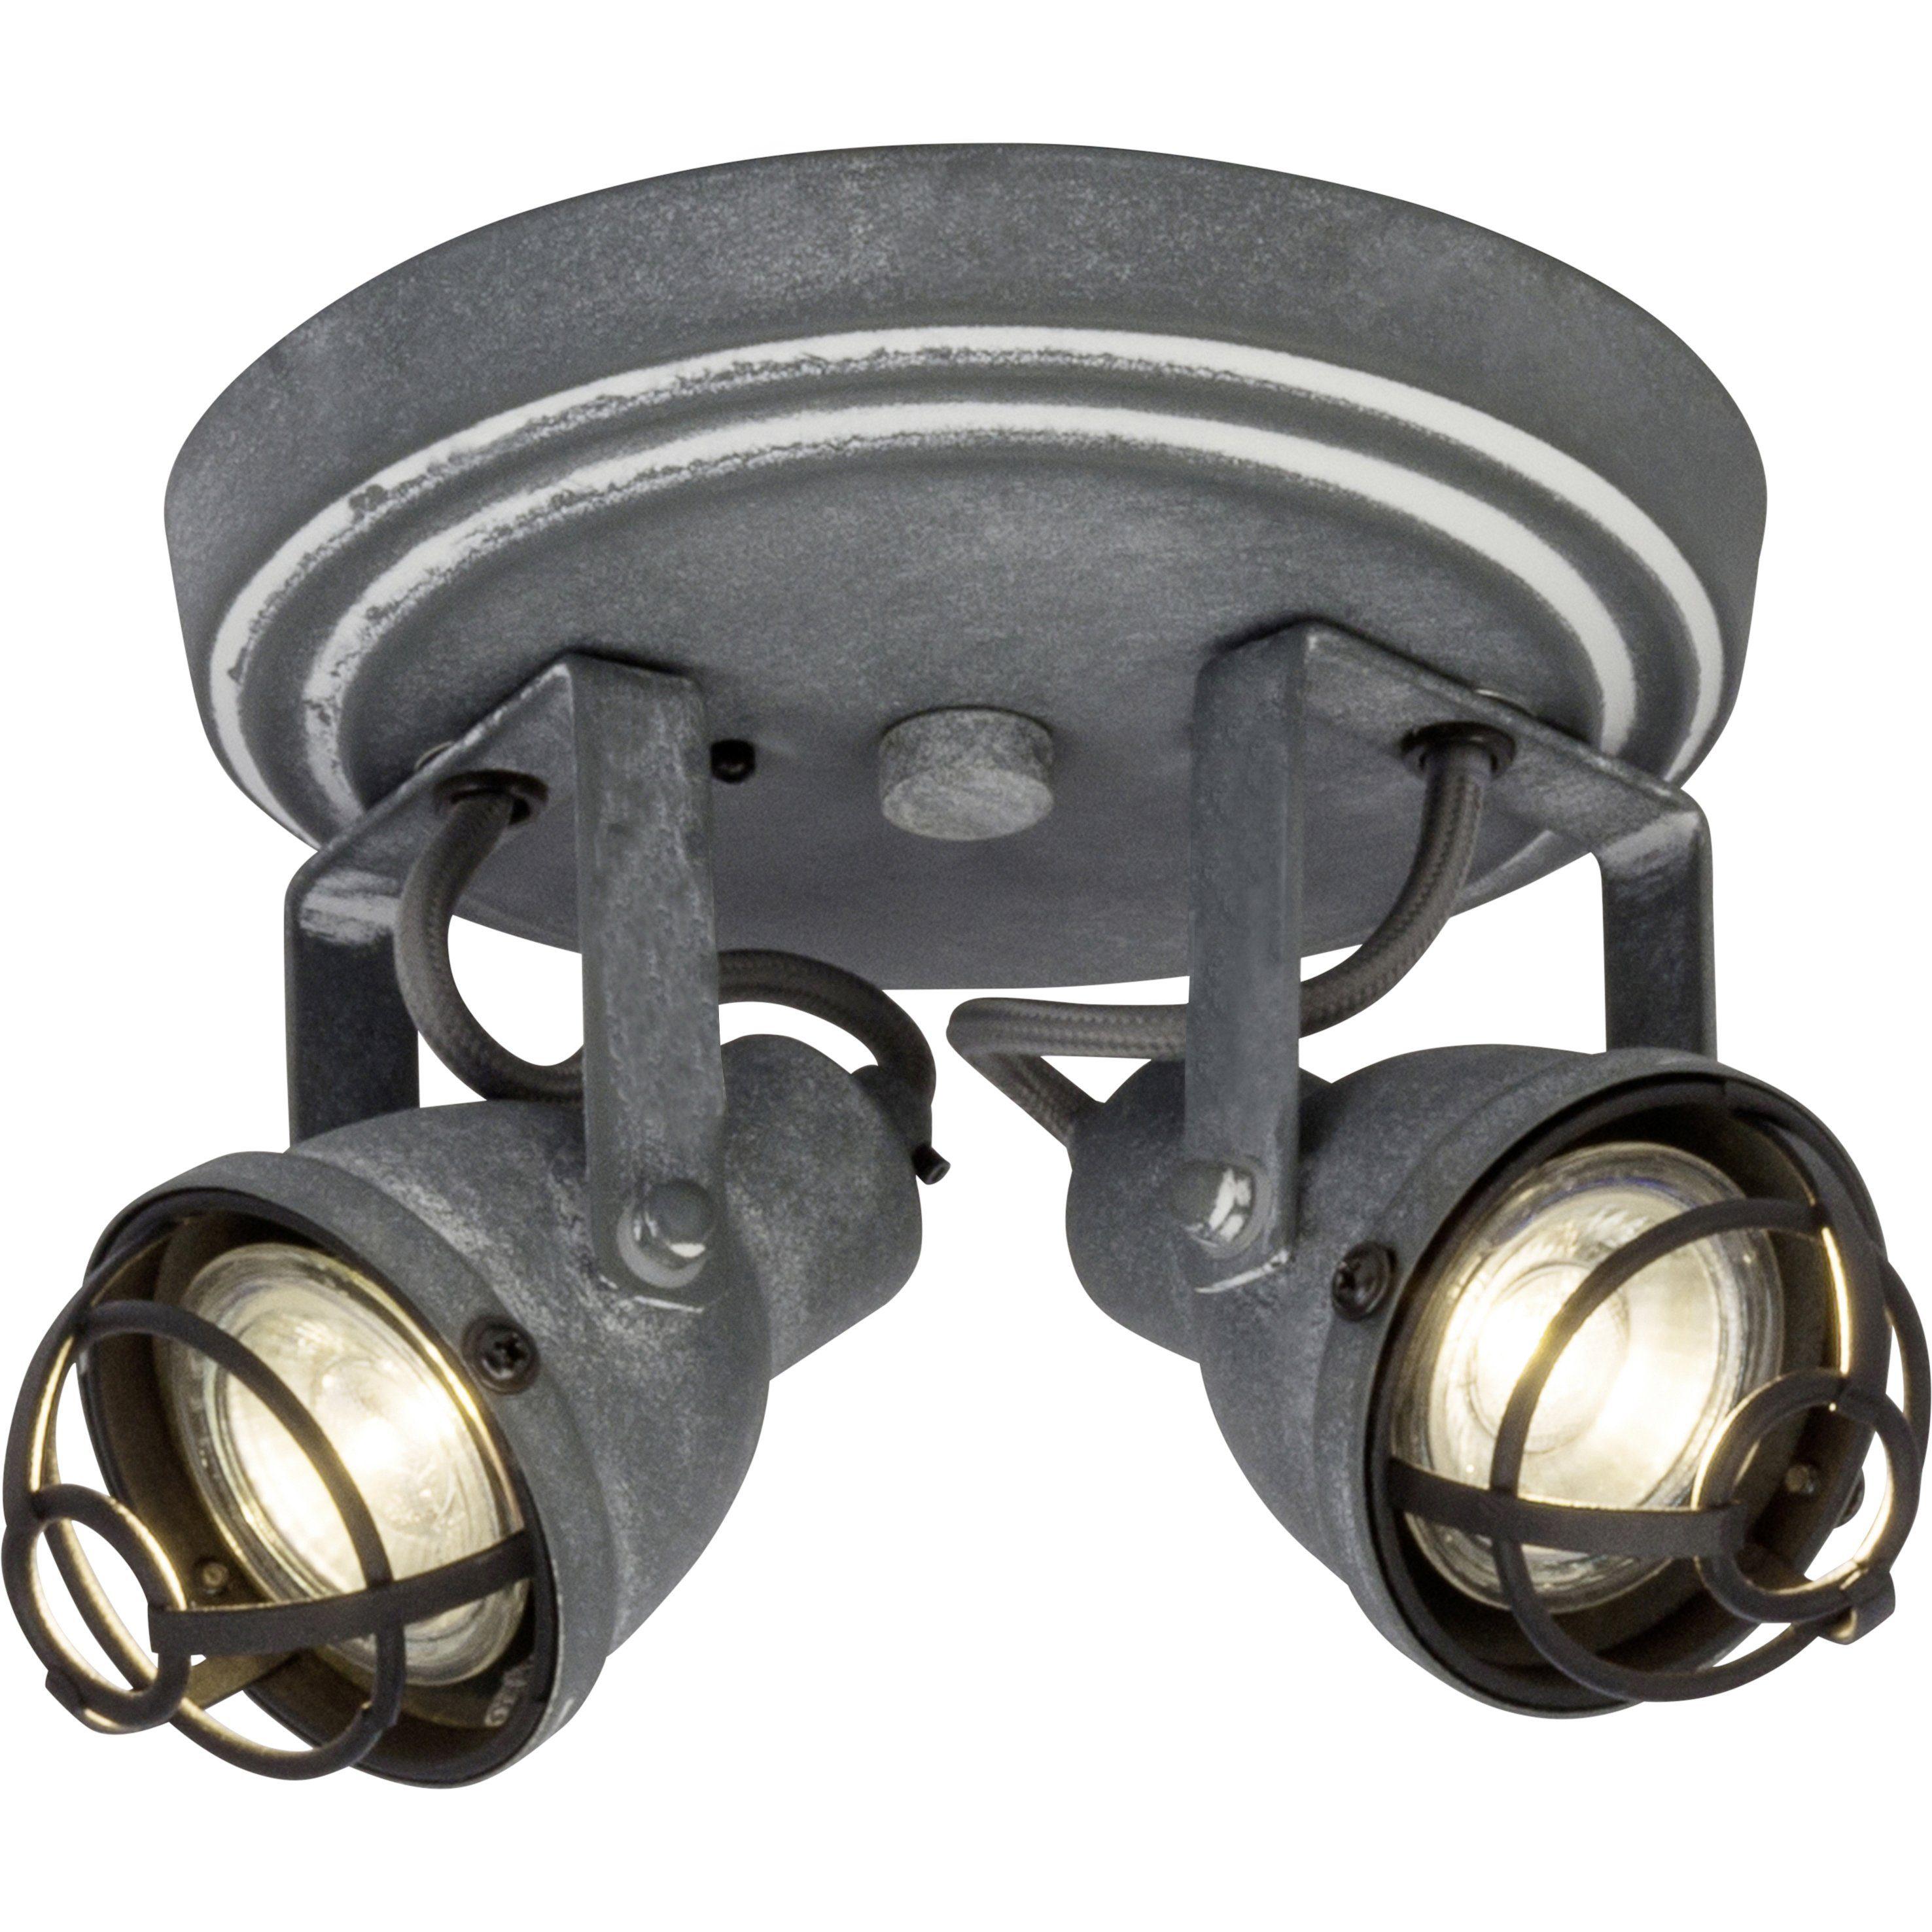 Brilliant Leuchten Bente LED Spotrondell 2flg grau Beton